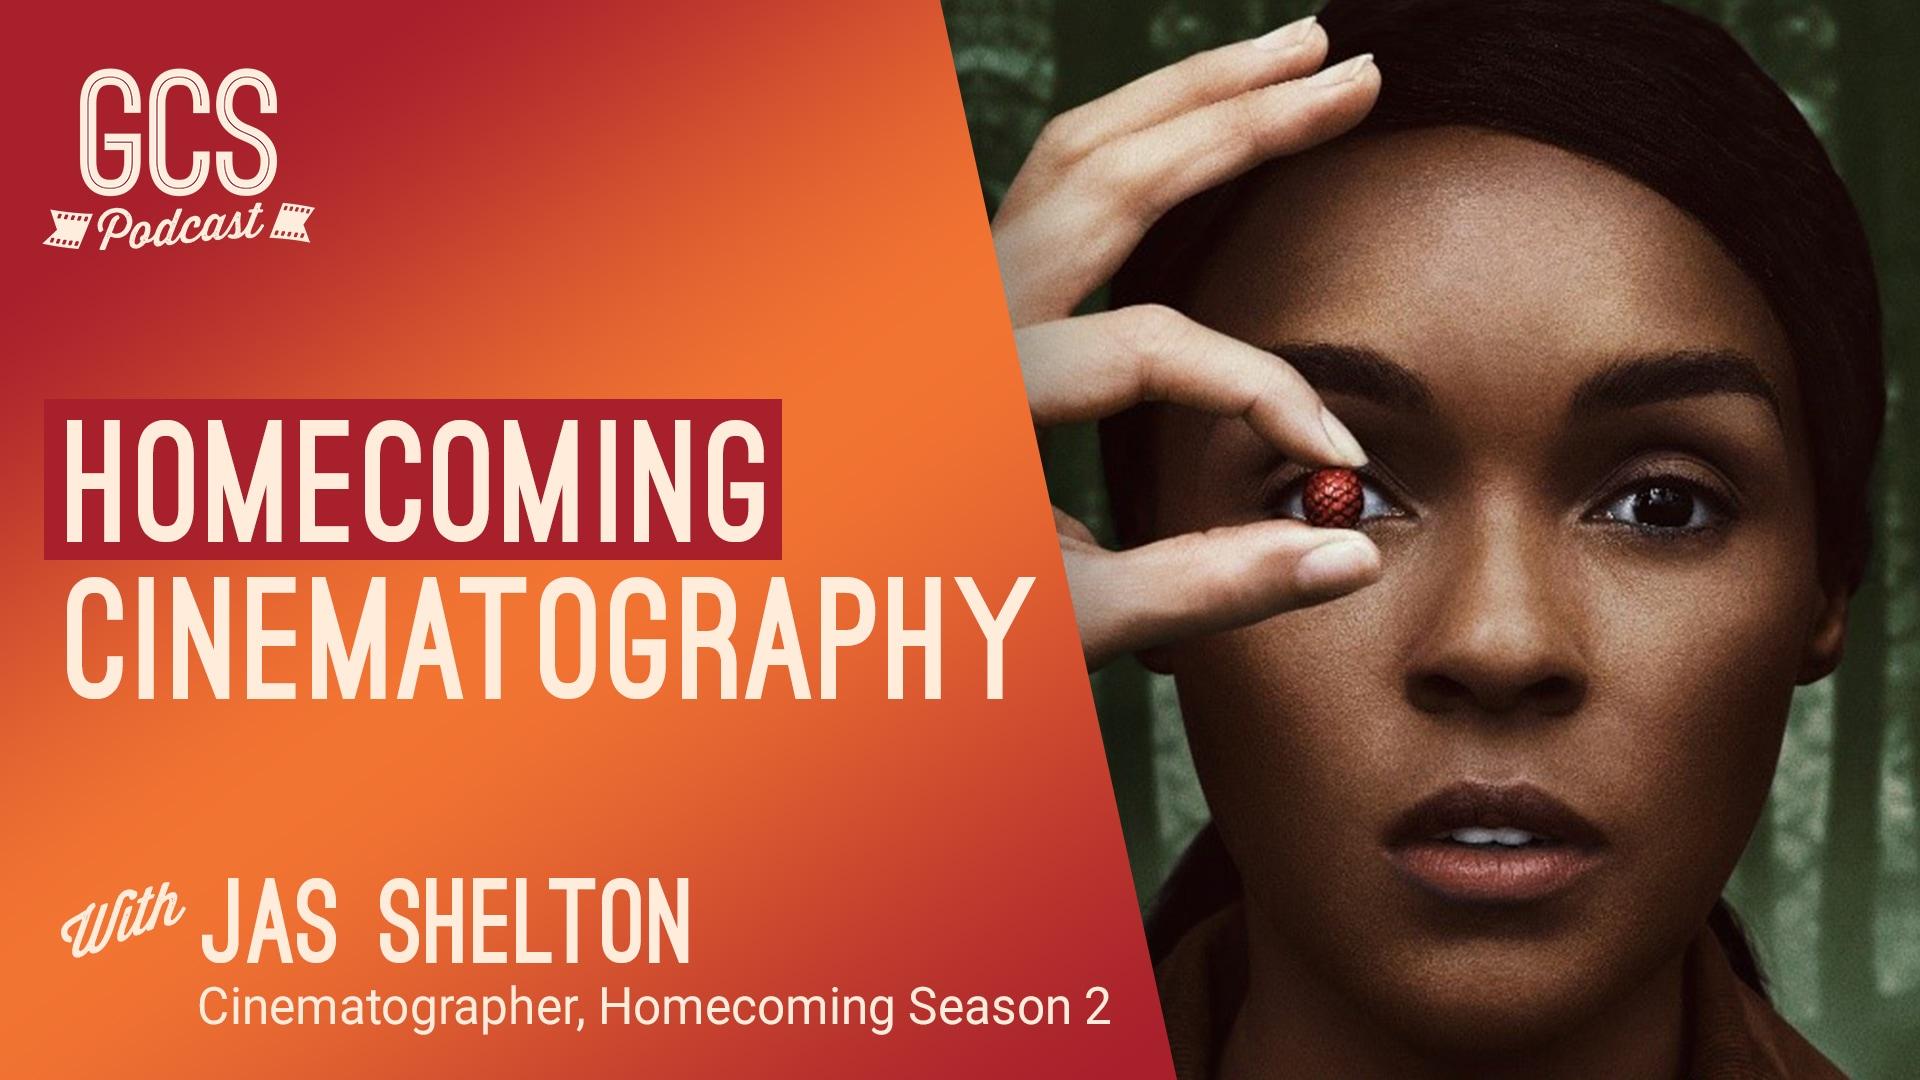 Go Creative Show: Homecoming Season 2 Cinematography (with Jas Shelton)